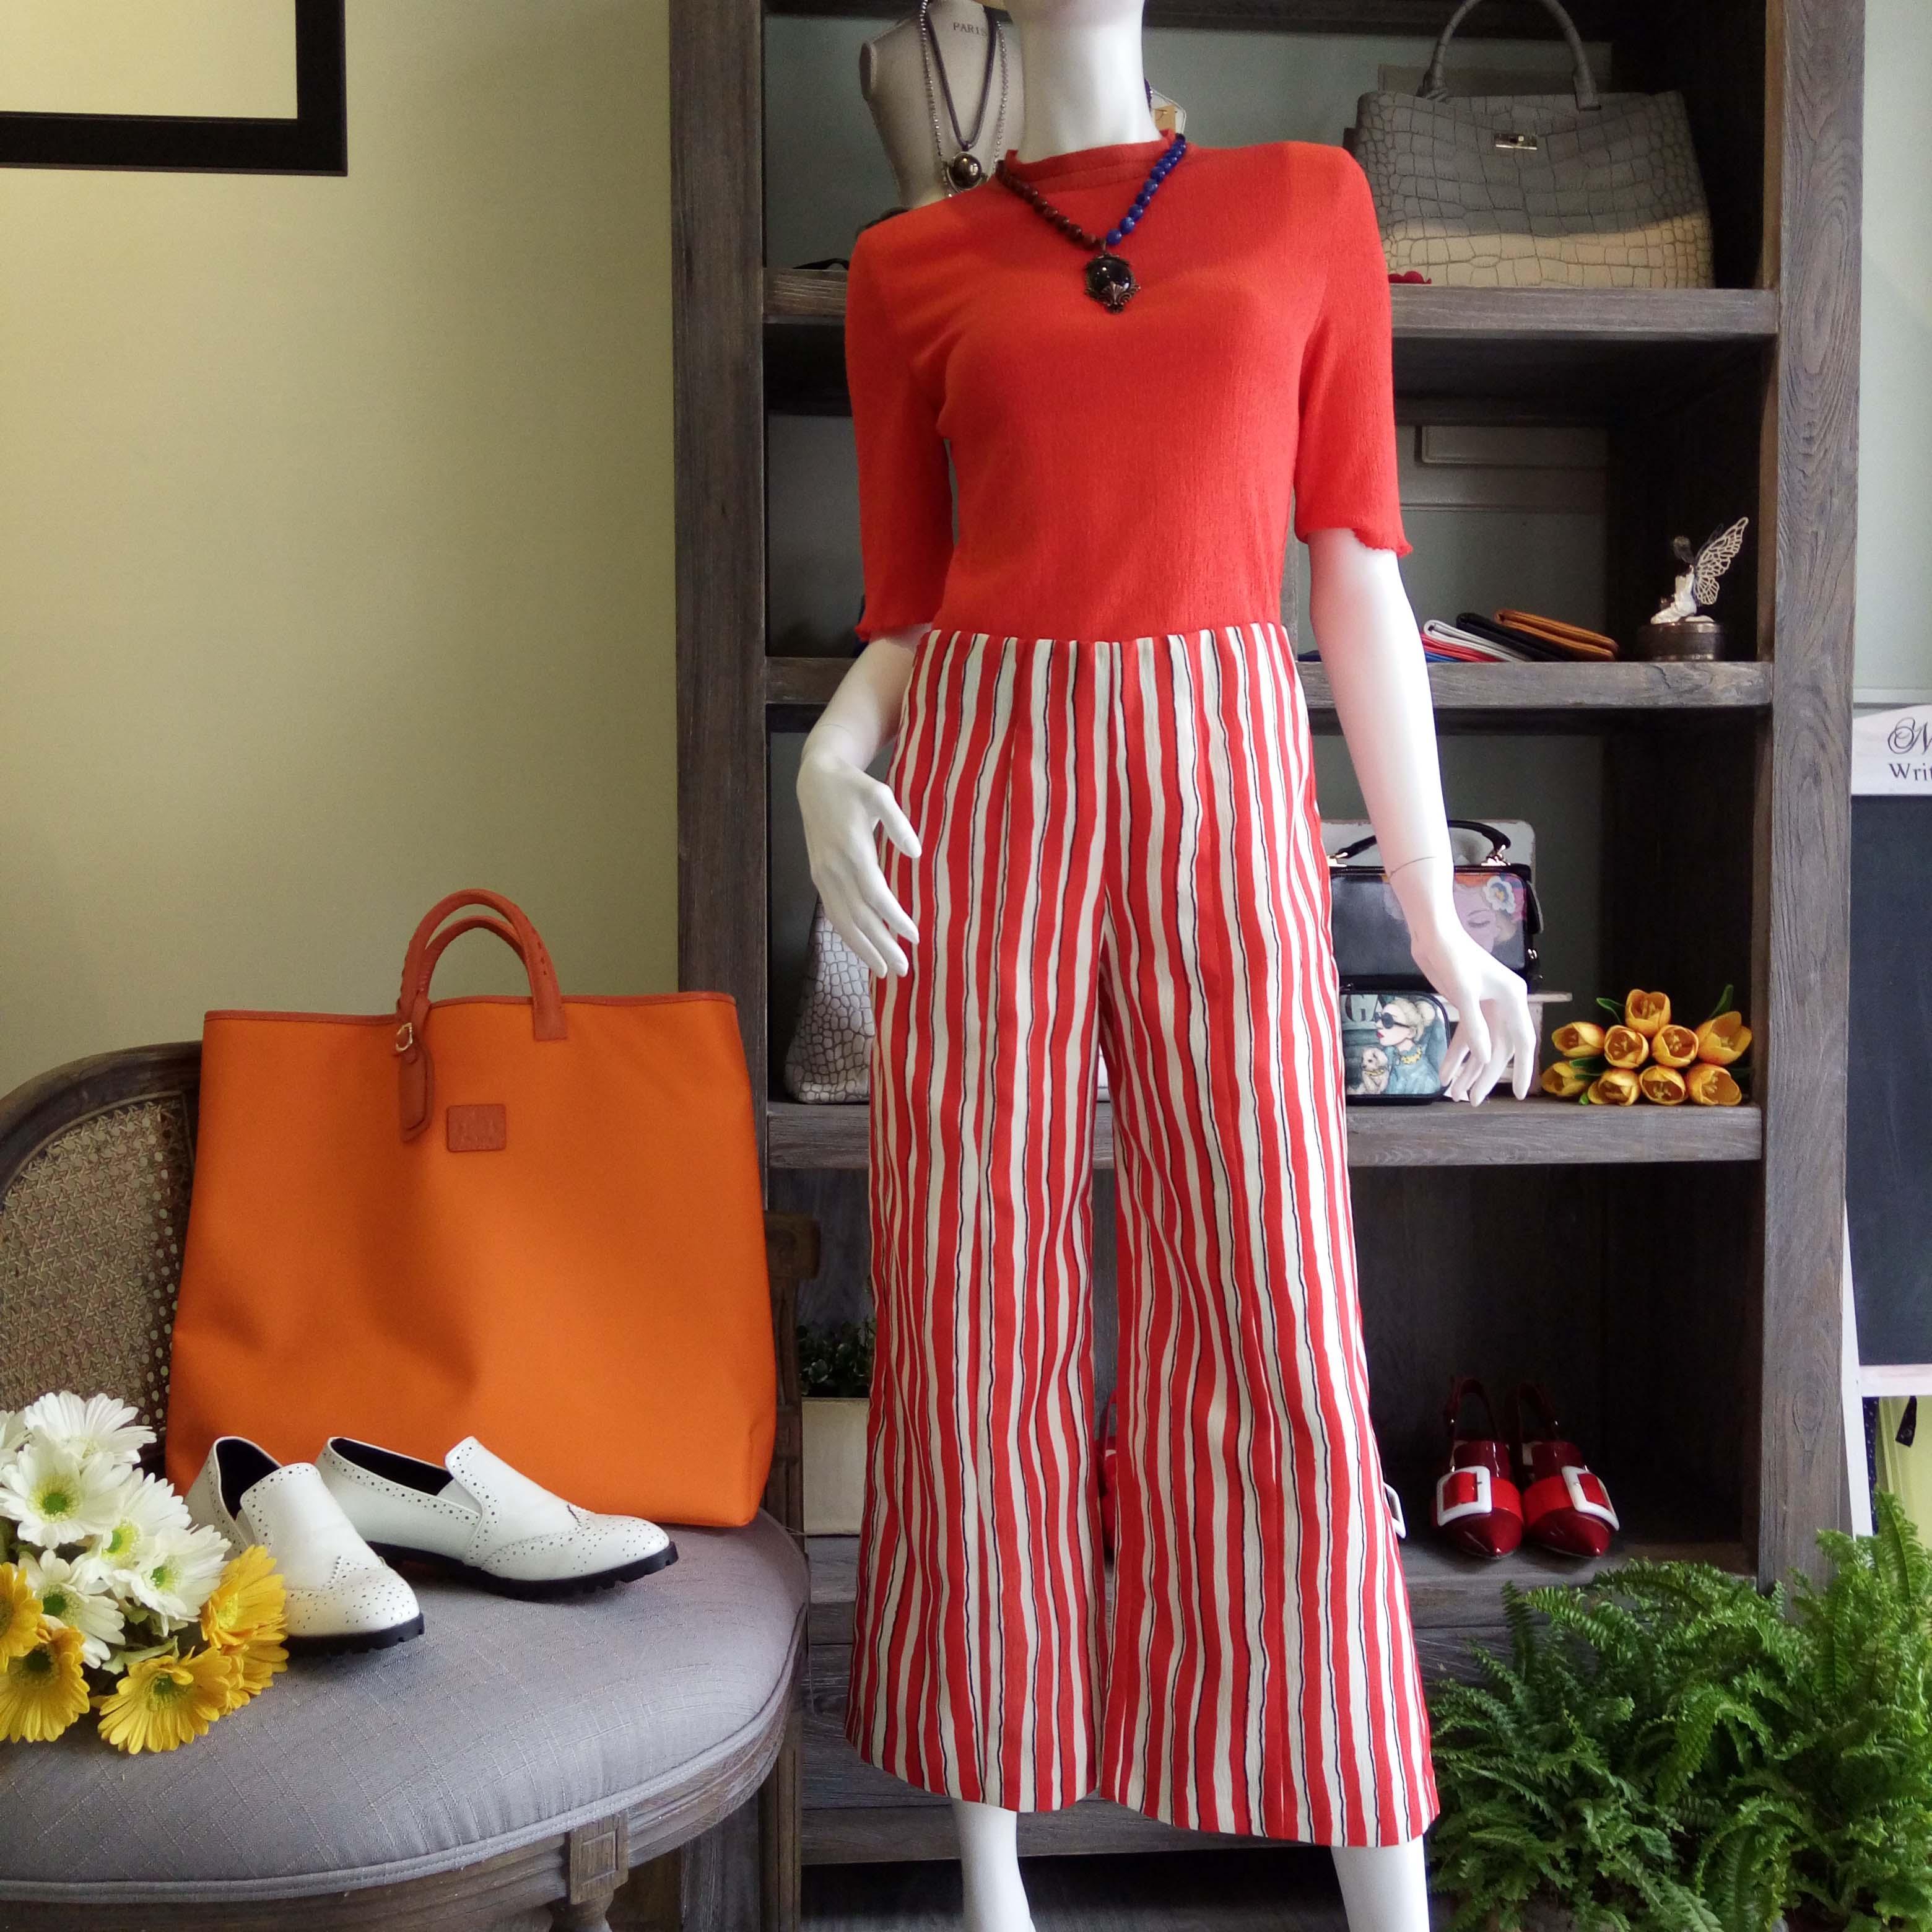 AXIS 1731一起賞衣【慶開店大優惠】法國Dior副牌-雙色條紋混紡寬版褲